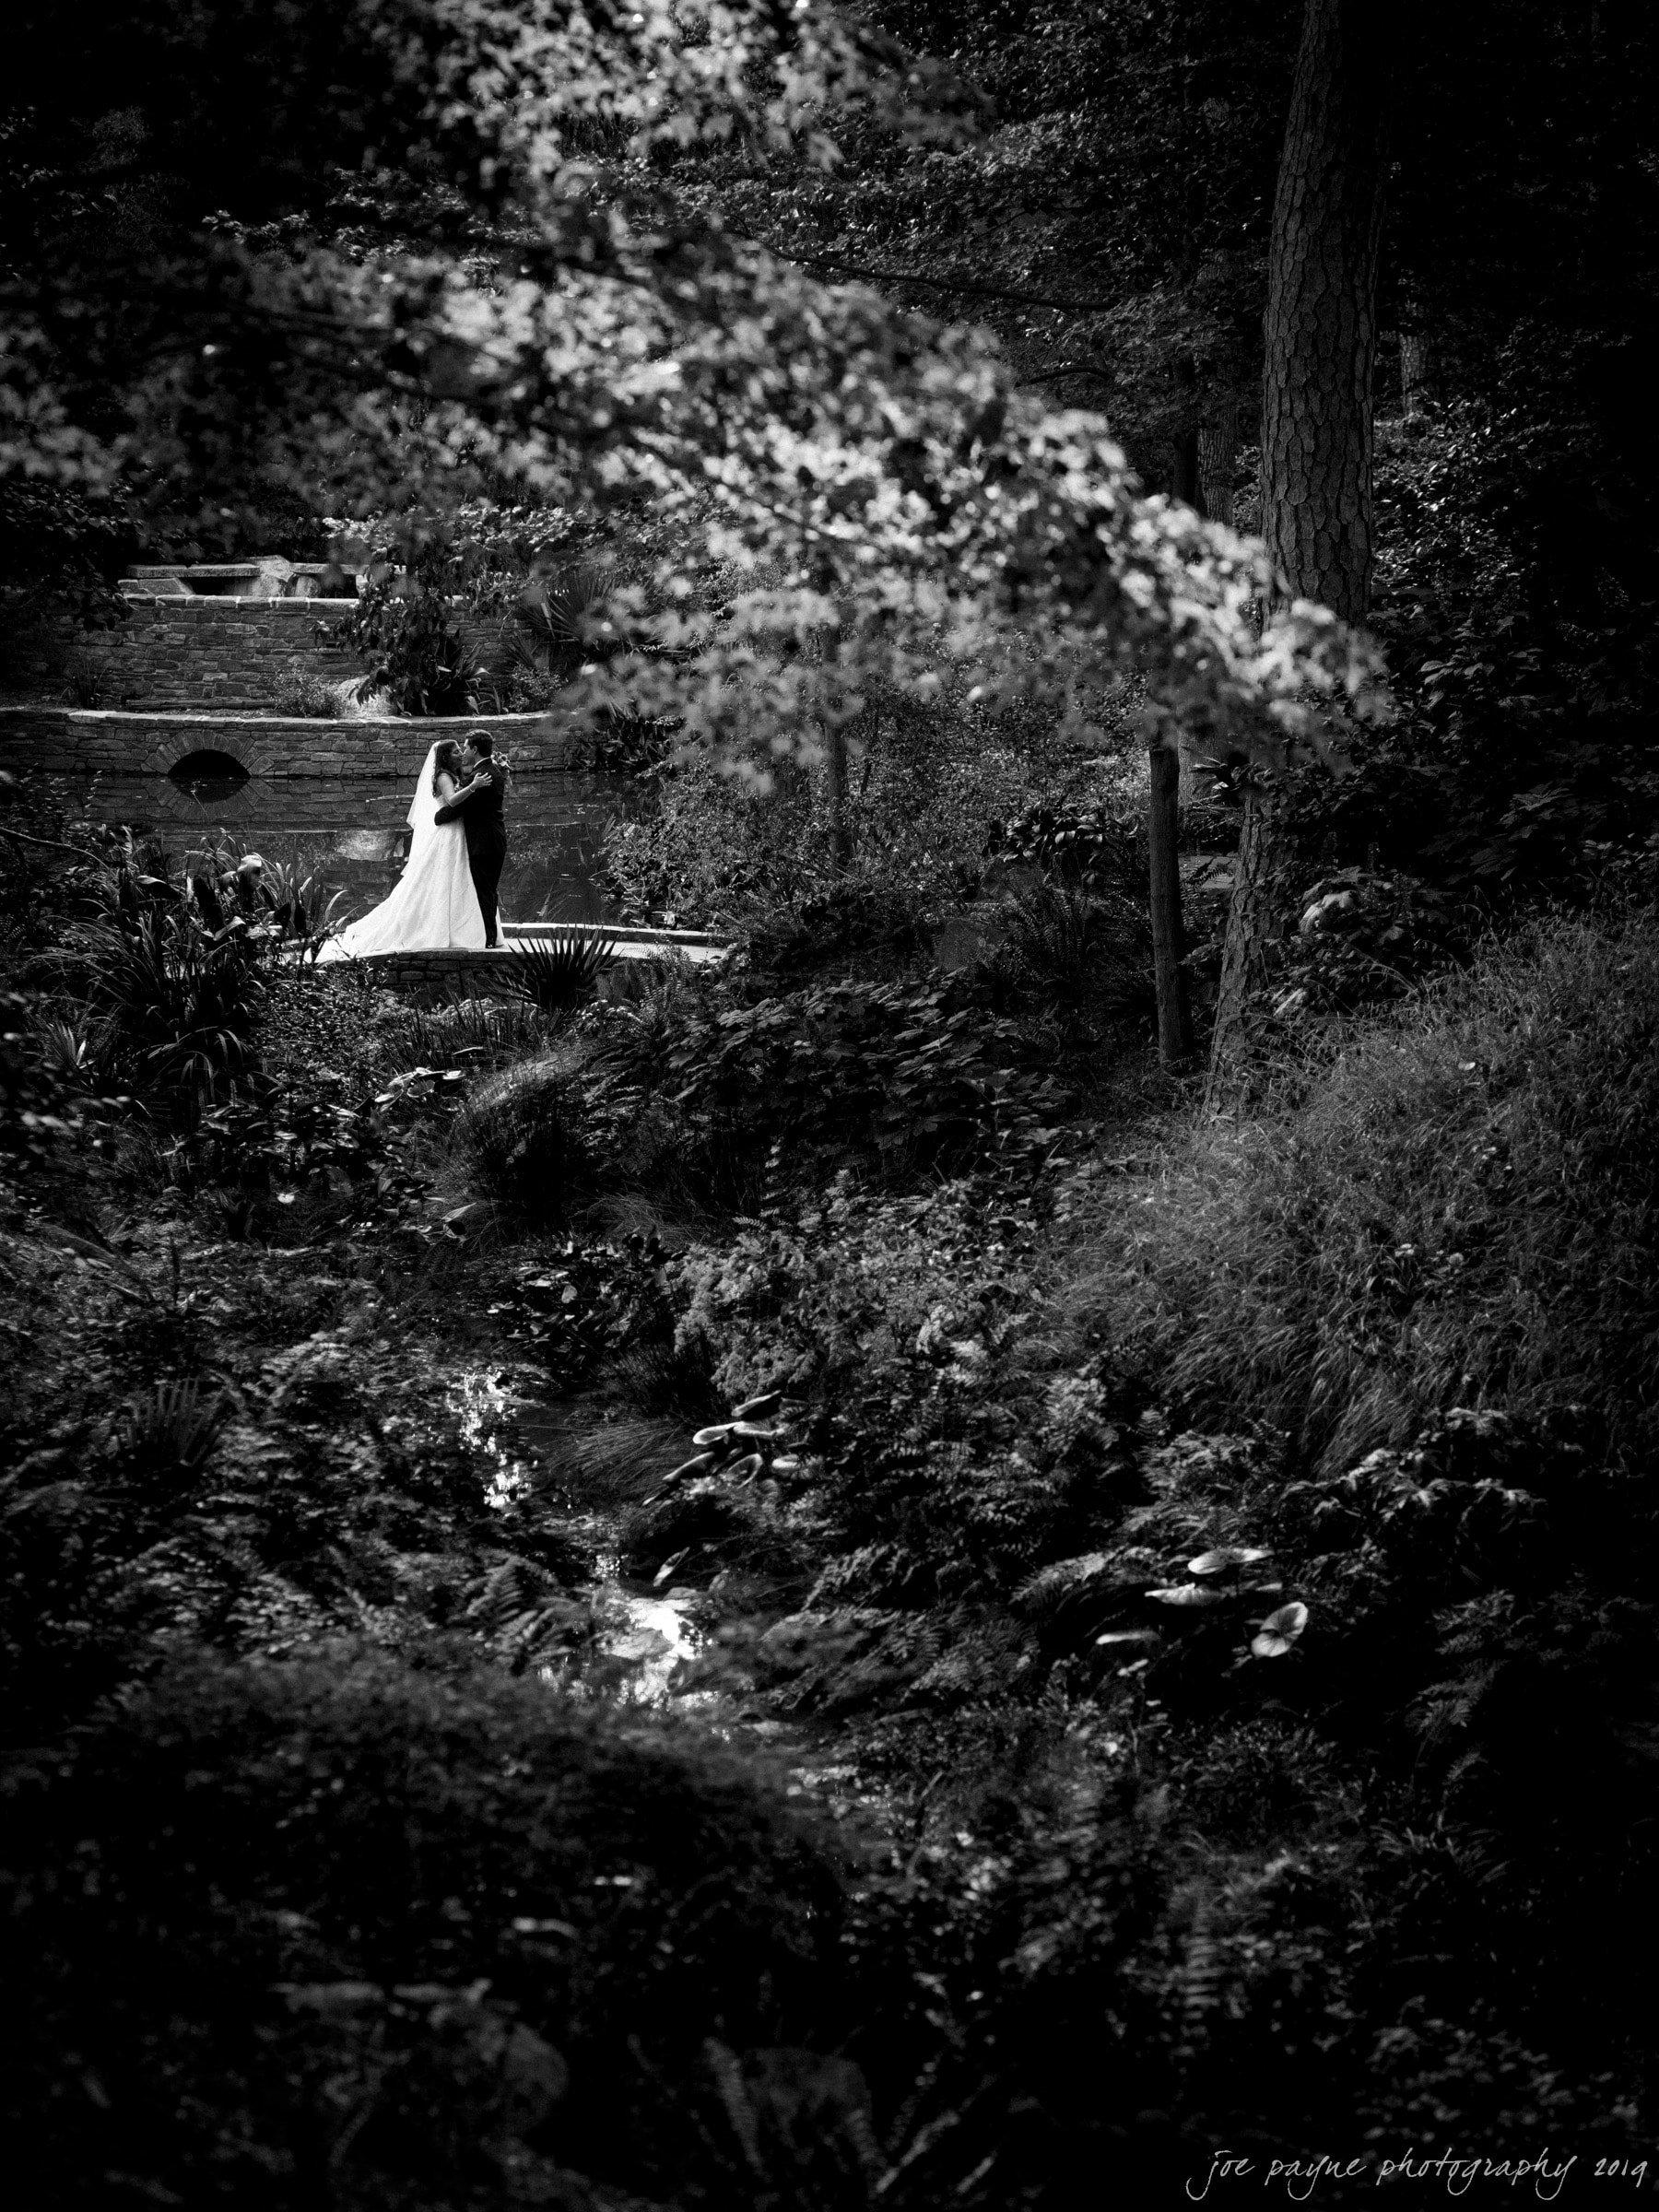 duke gardens wedding photography – diana & danny